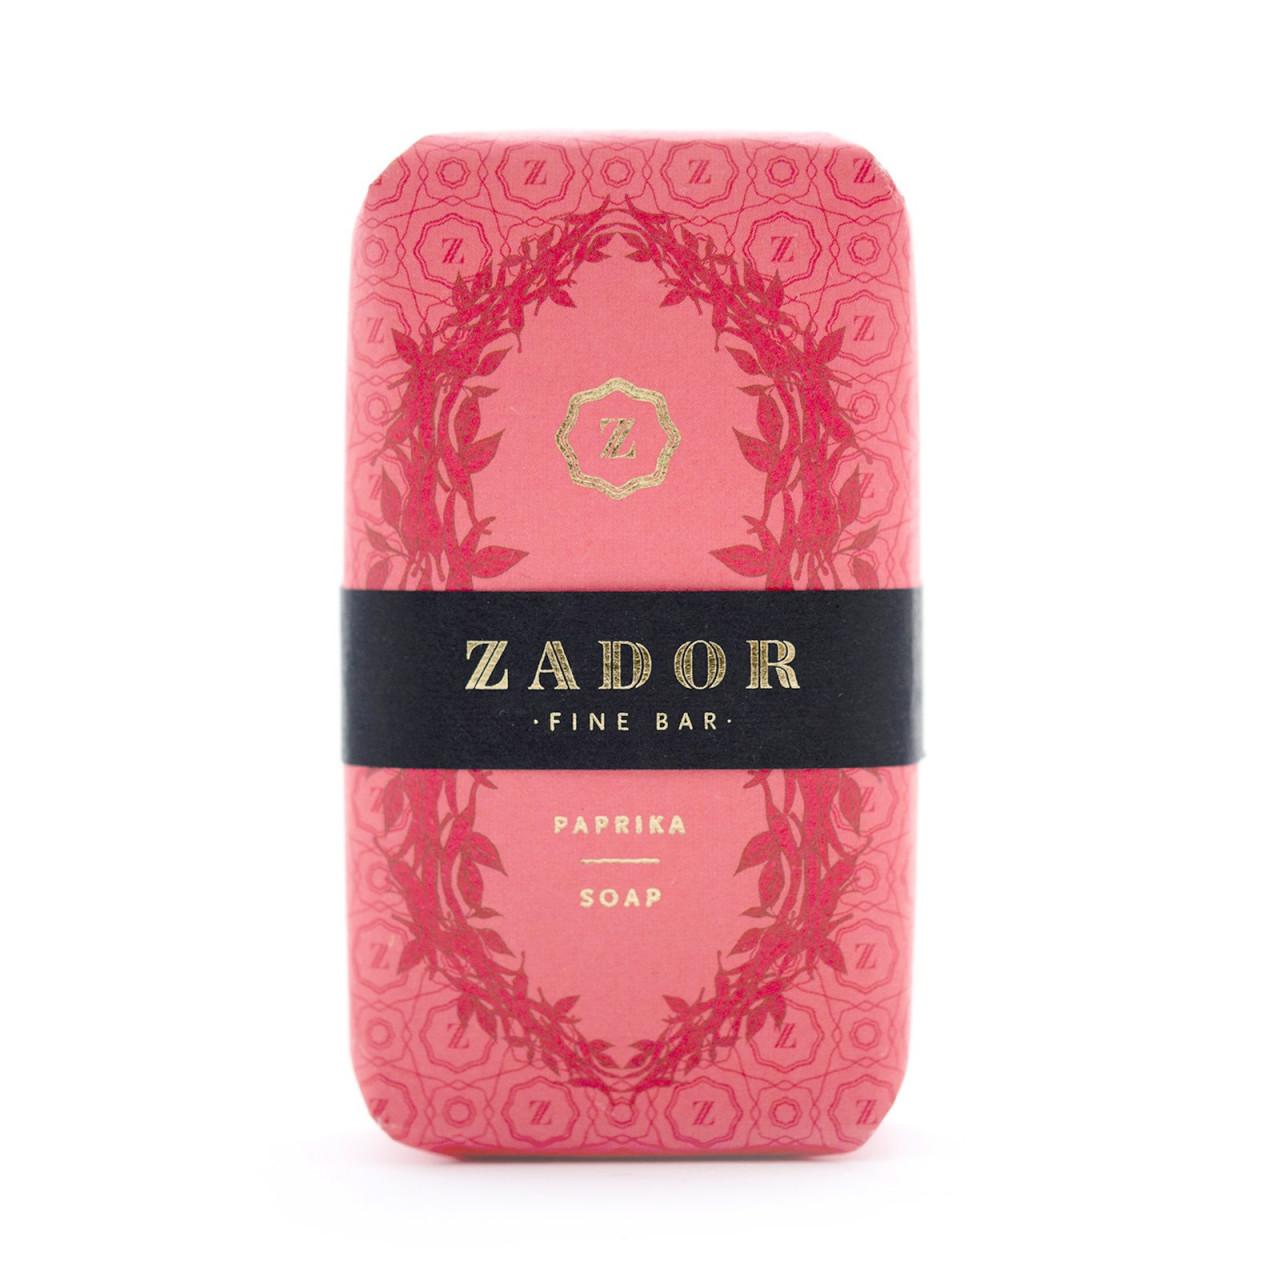 Zador Paprika Soap